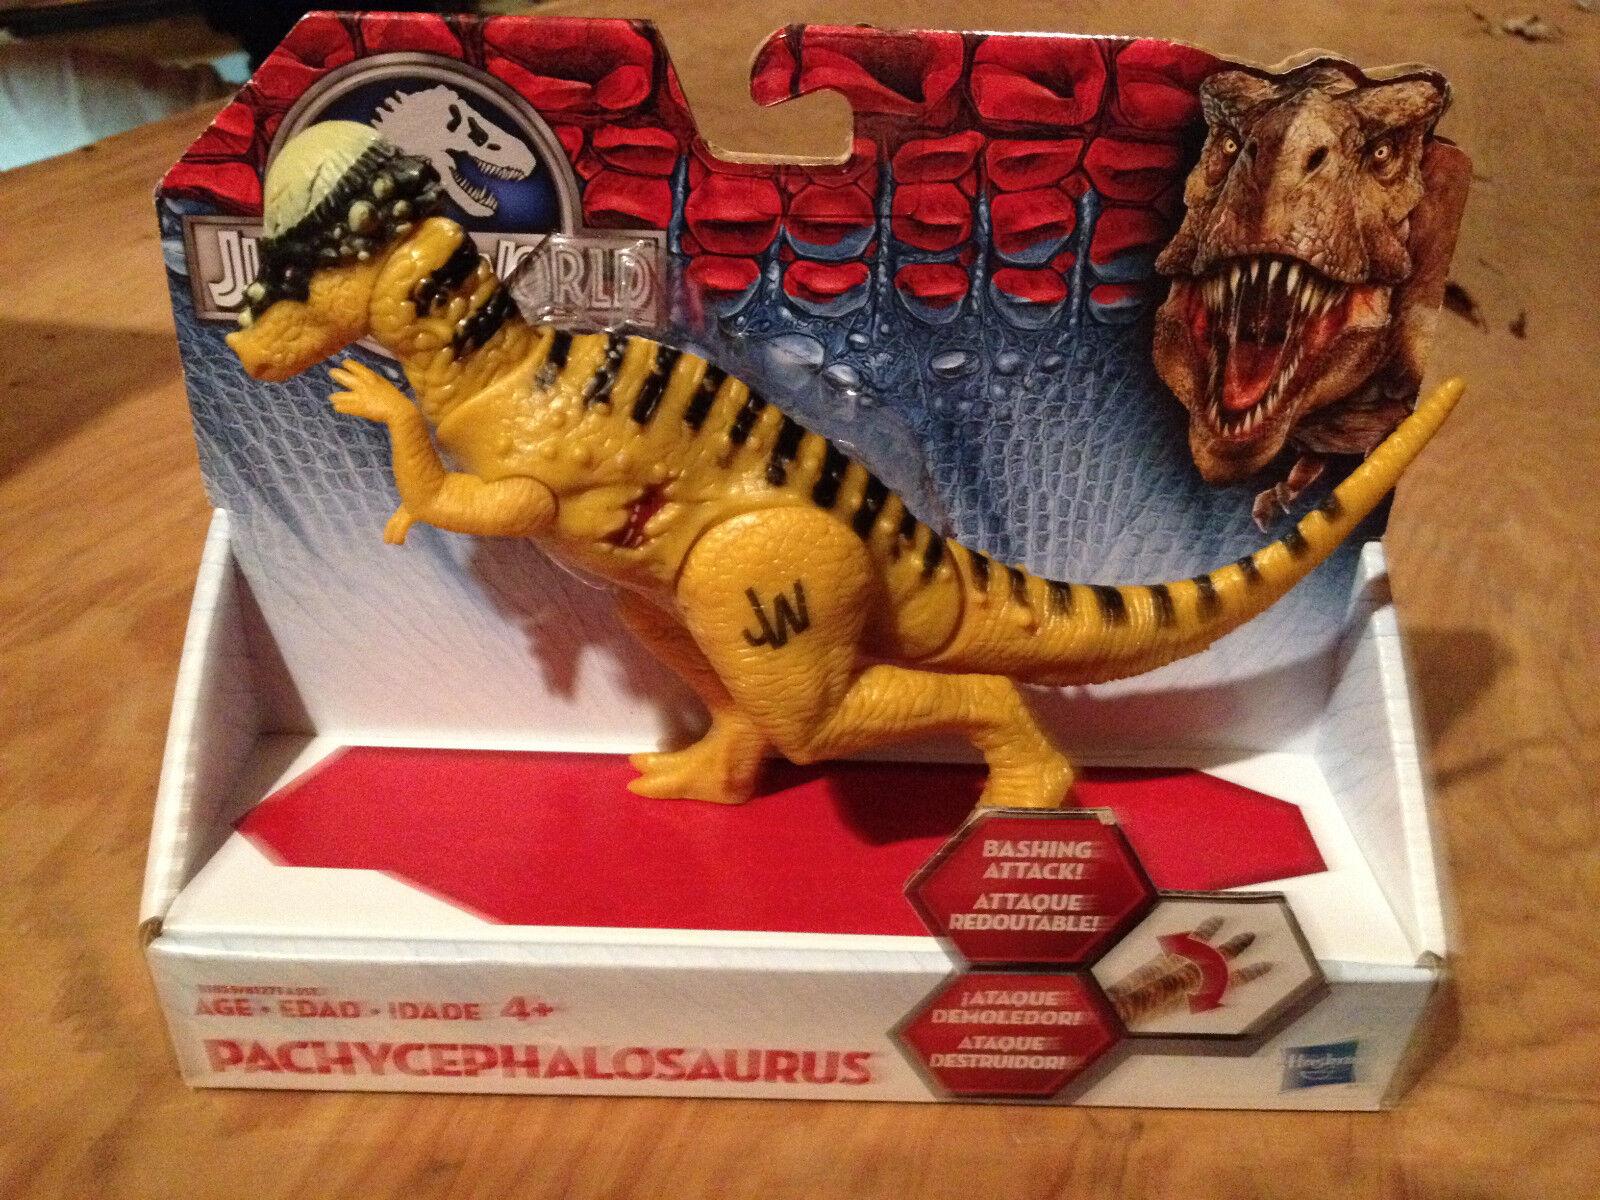 Jurassic World  Pachycephalosaurus  Bashers & Biters Dinosaur  Light Wear